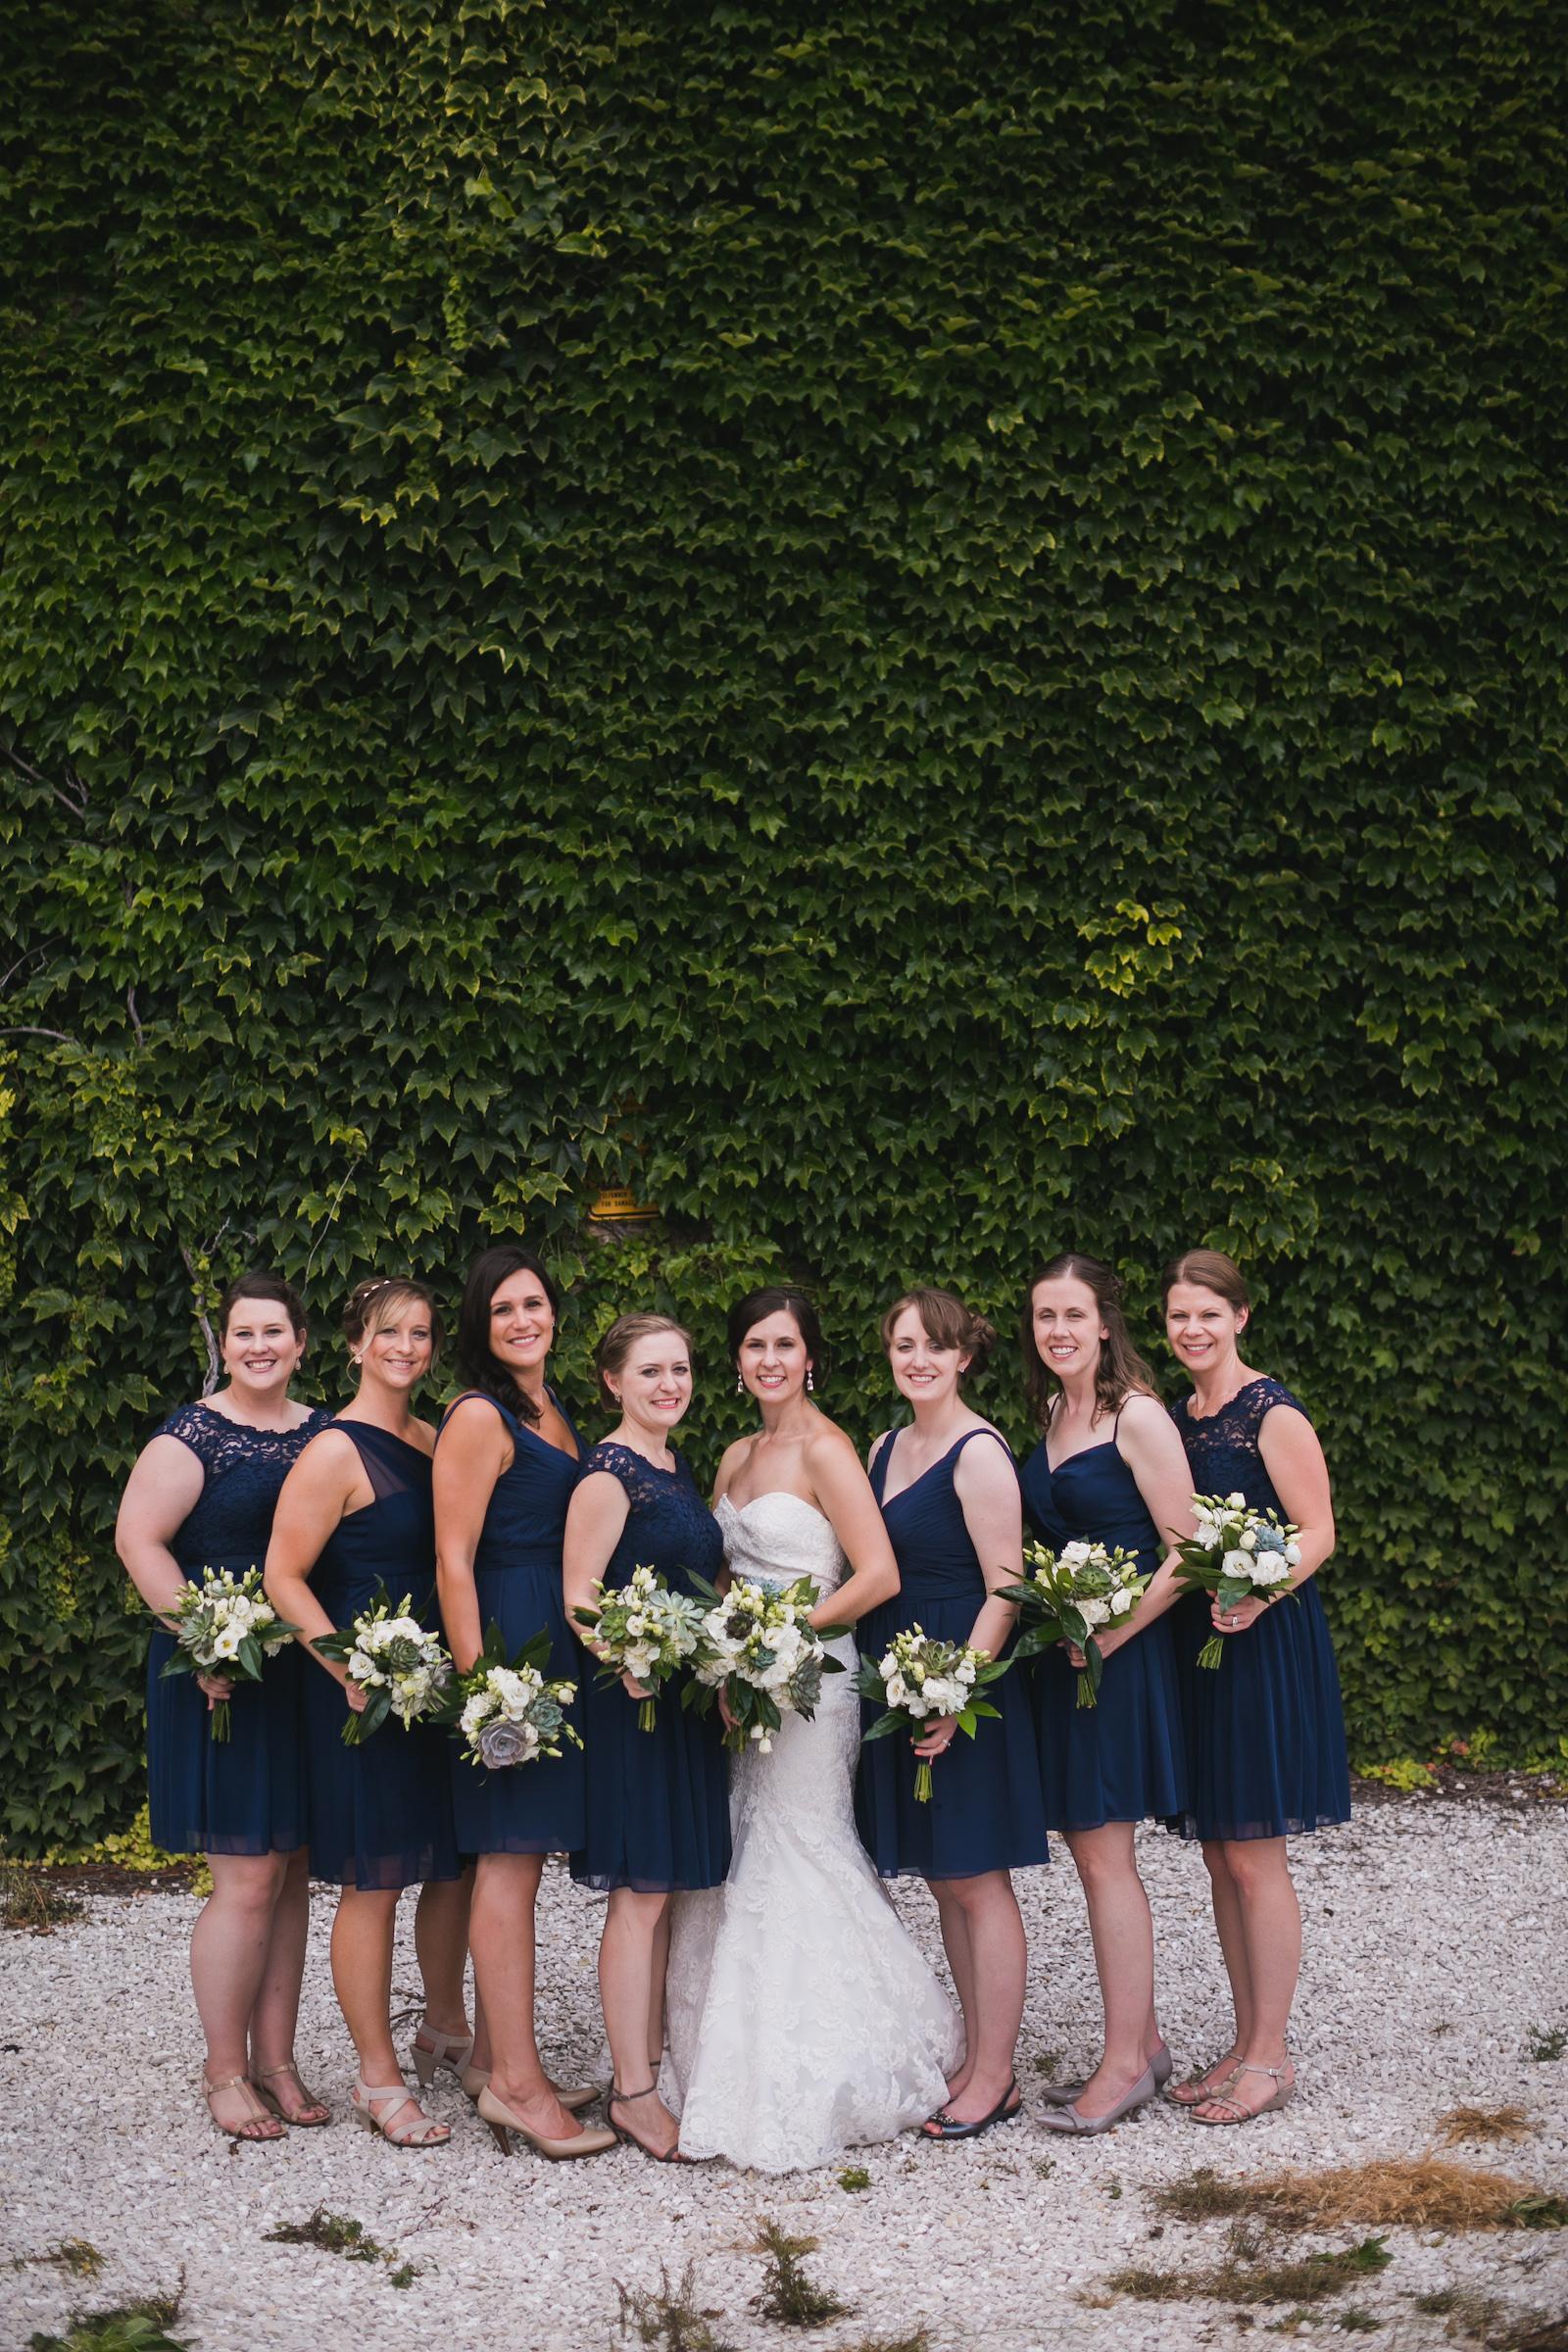 wisconsin-wedding-acowsay-uttke-photography-31.jpg